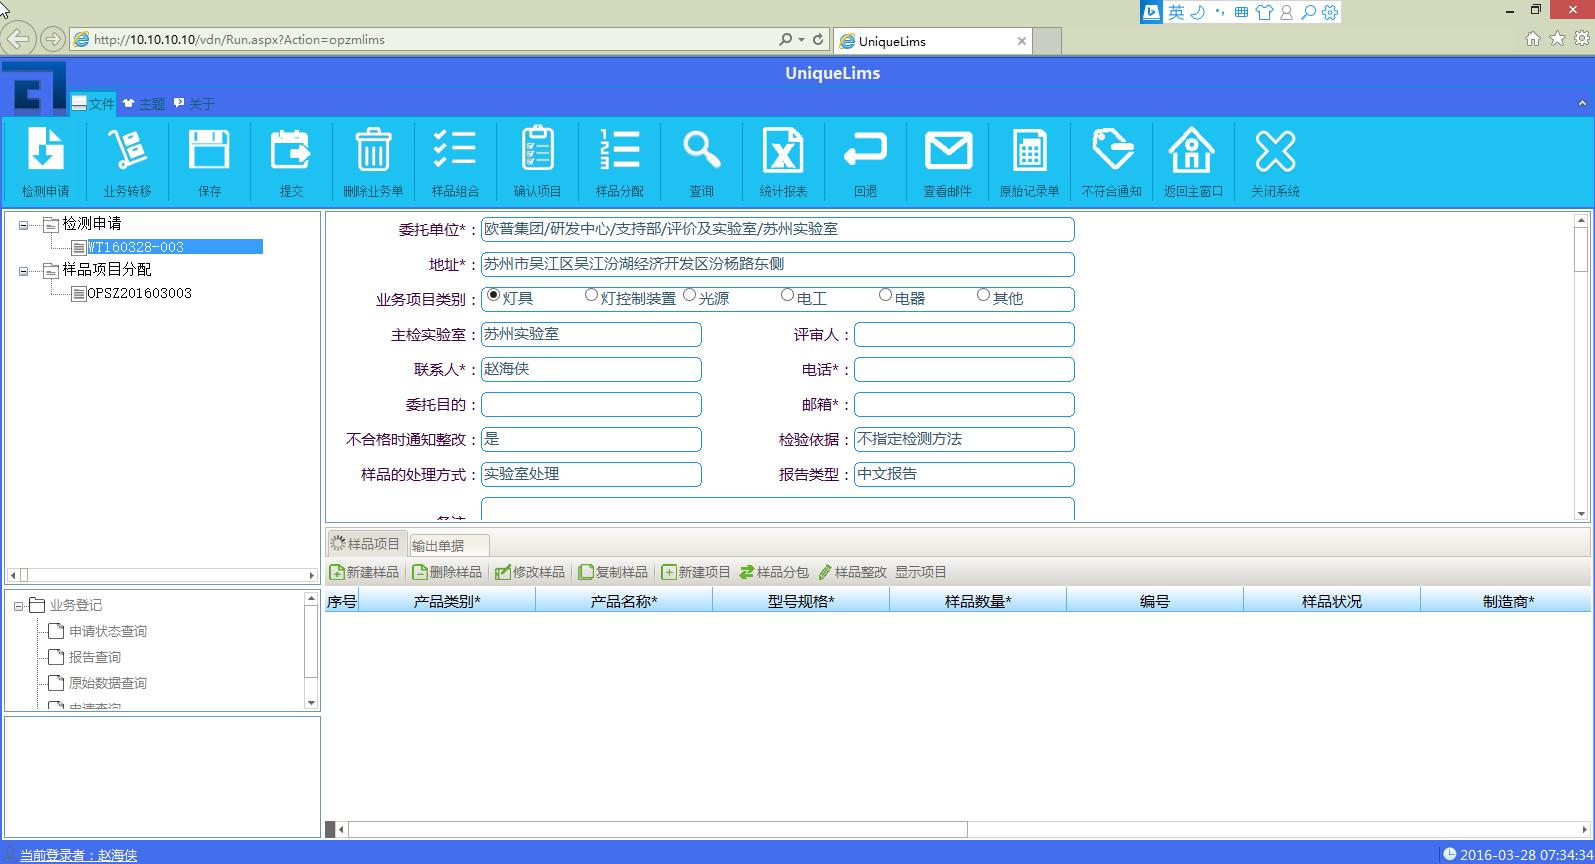 lims检测申请输入界面-选择合同评审人